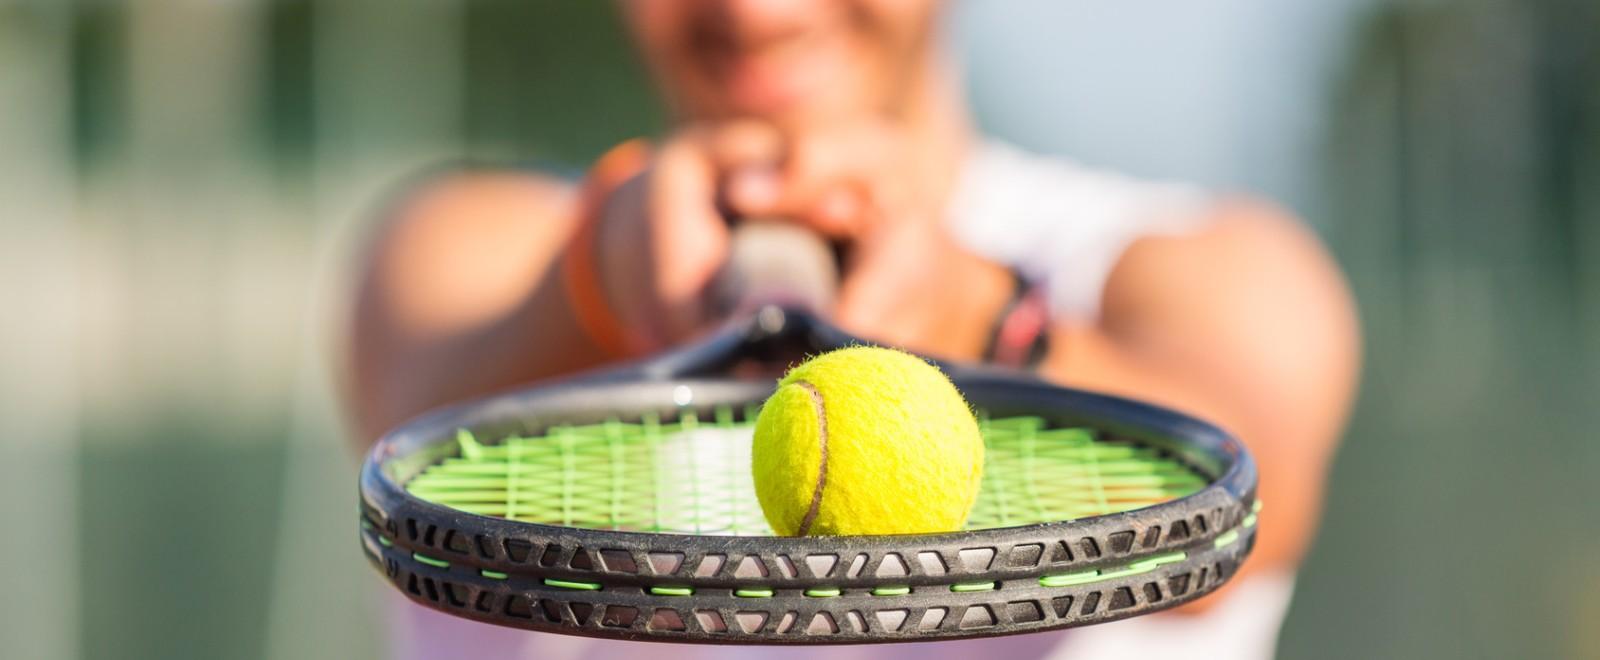 tennis_f_53232785